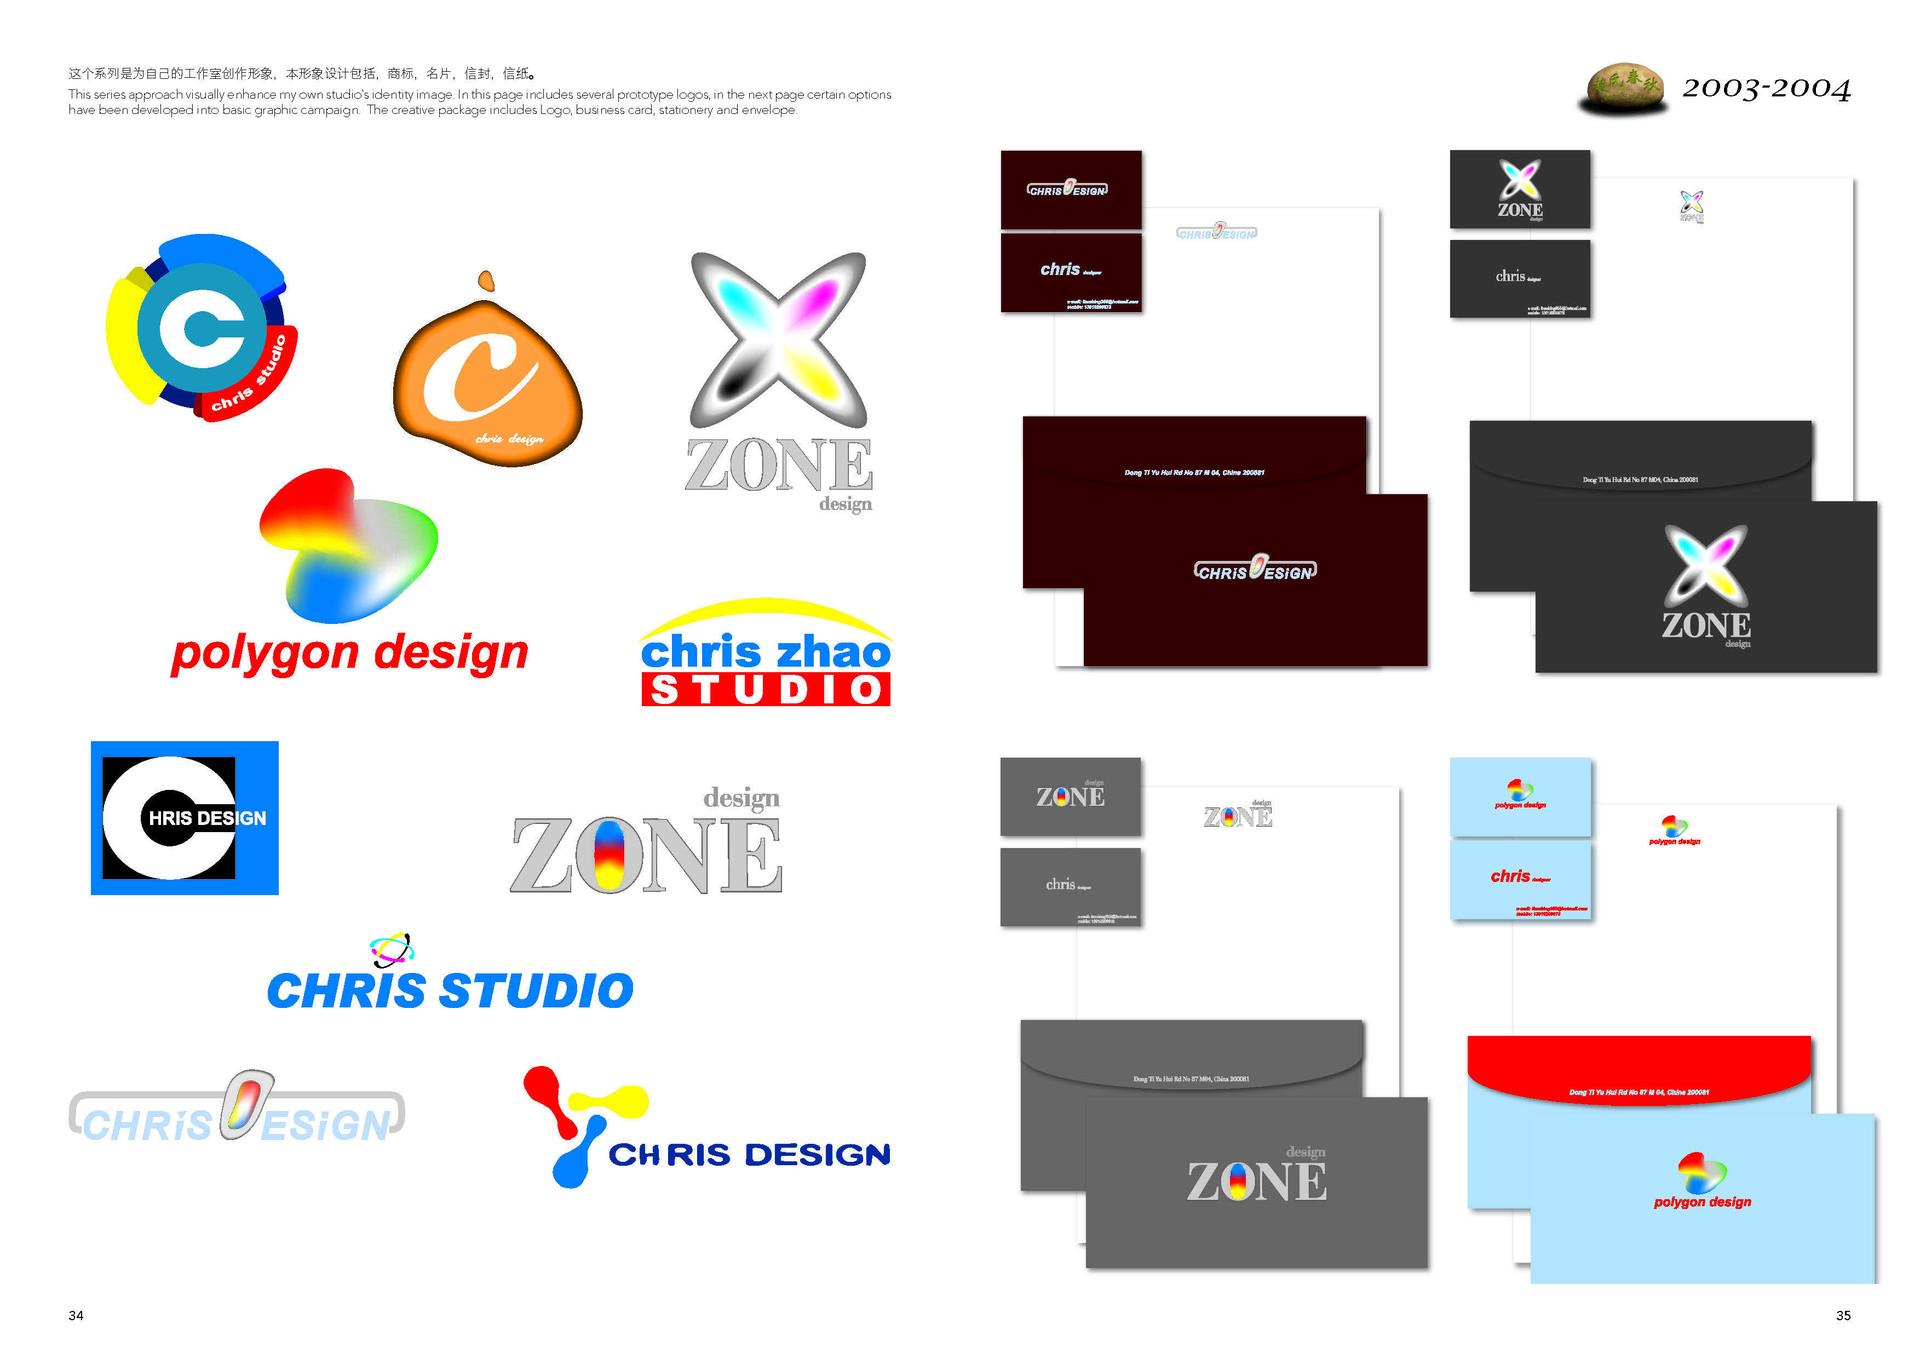 Chris qing qing zhao graphic design portfolio page 05